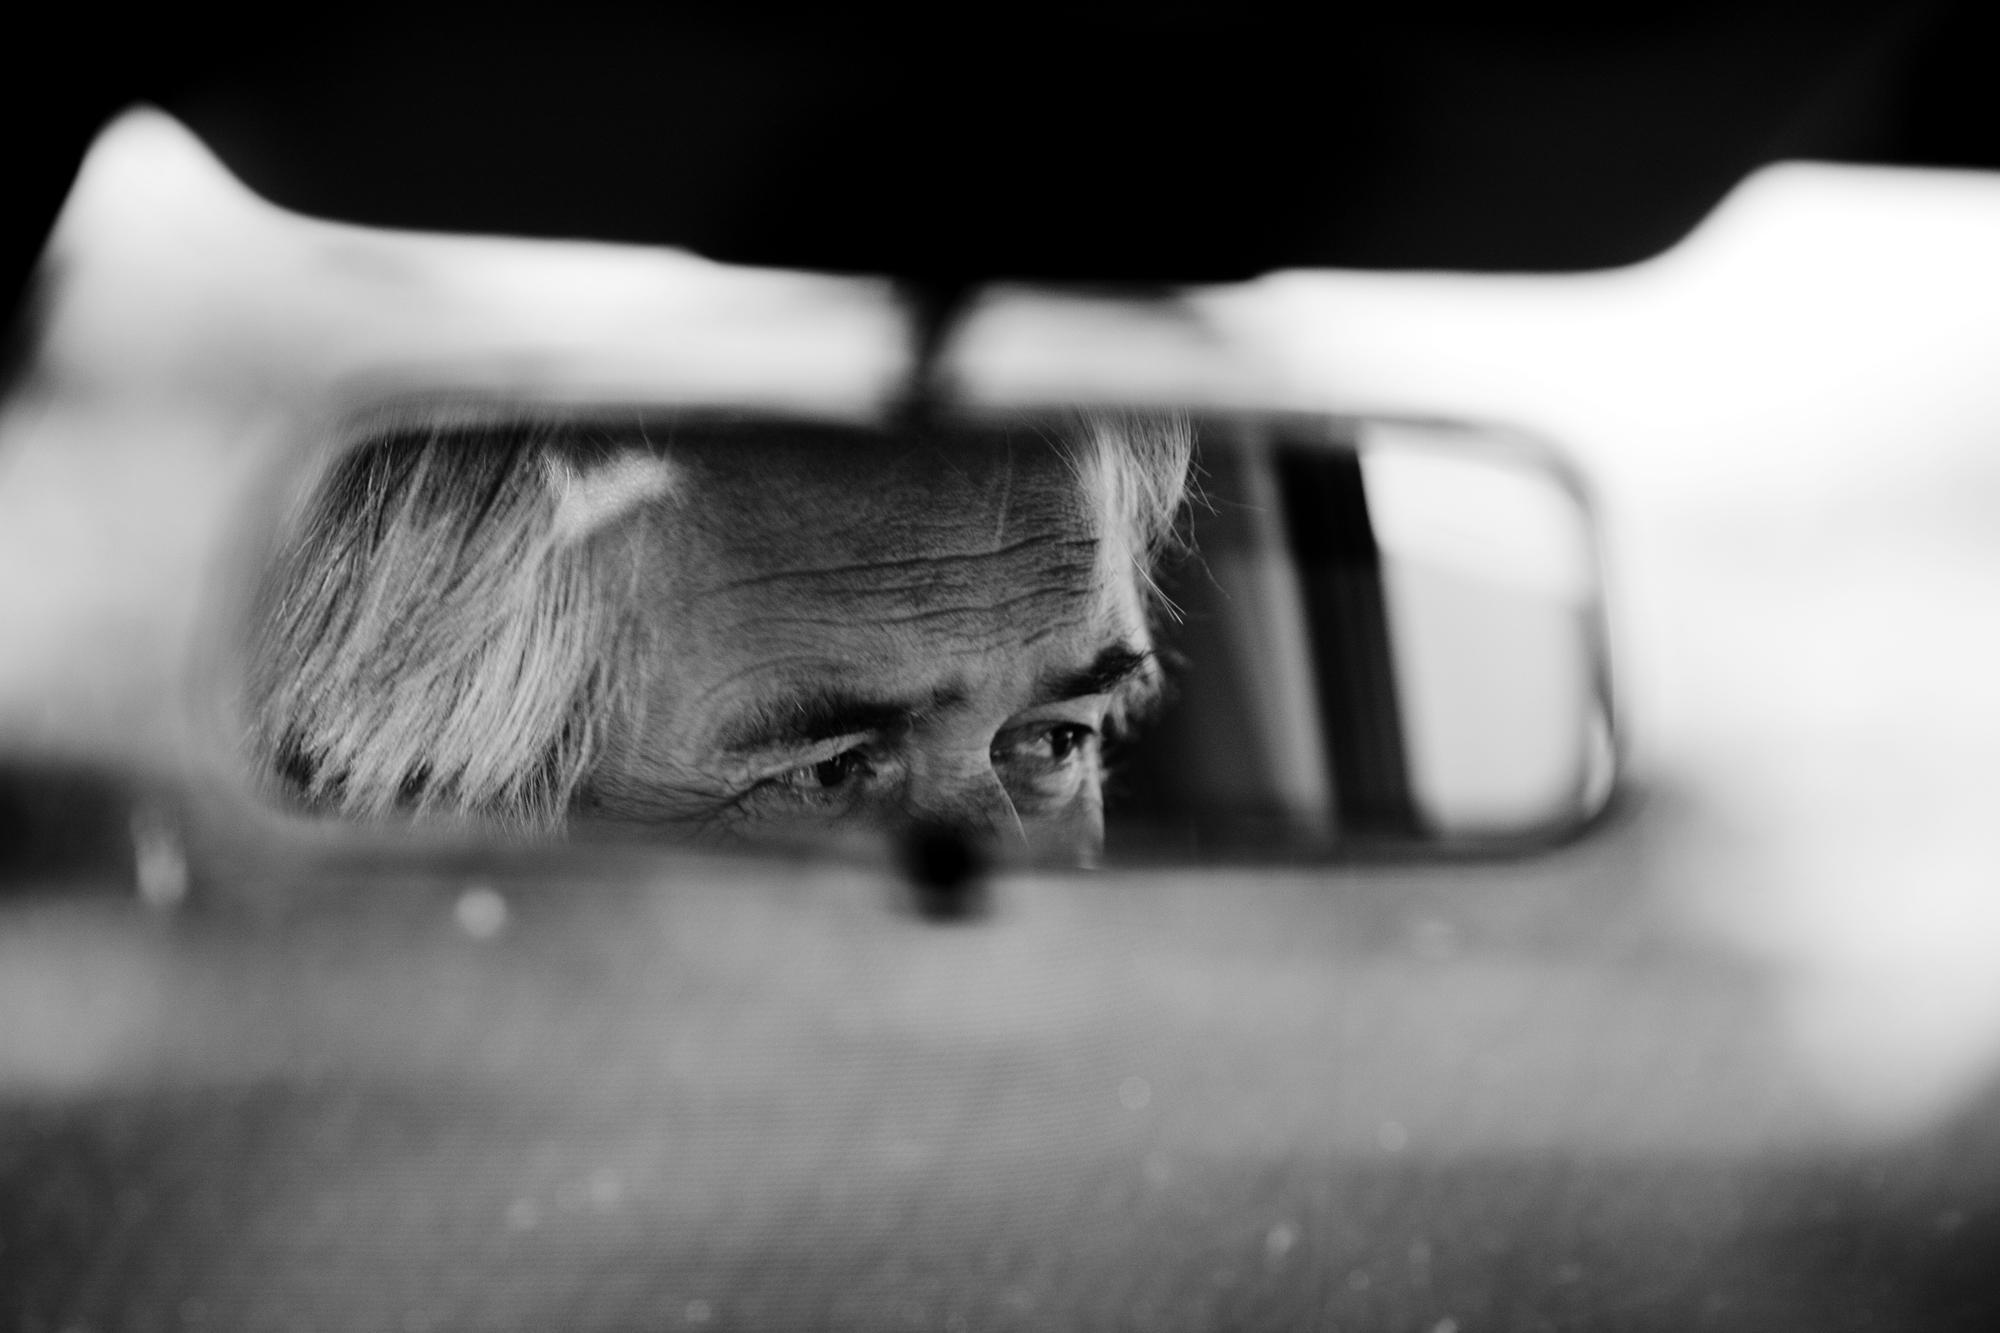 KWAZULU NATAL, ESHOWE, SOUTH AFRICA Henning Mankell driving a car.